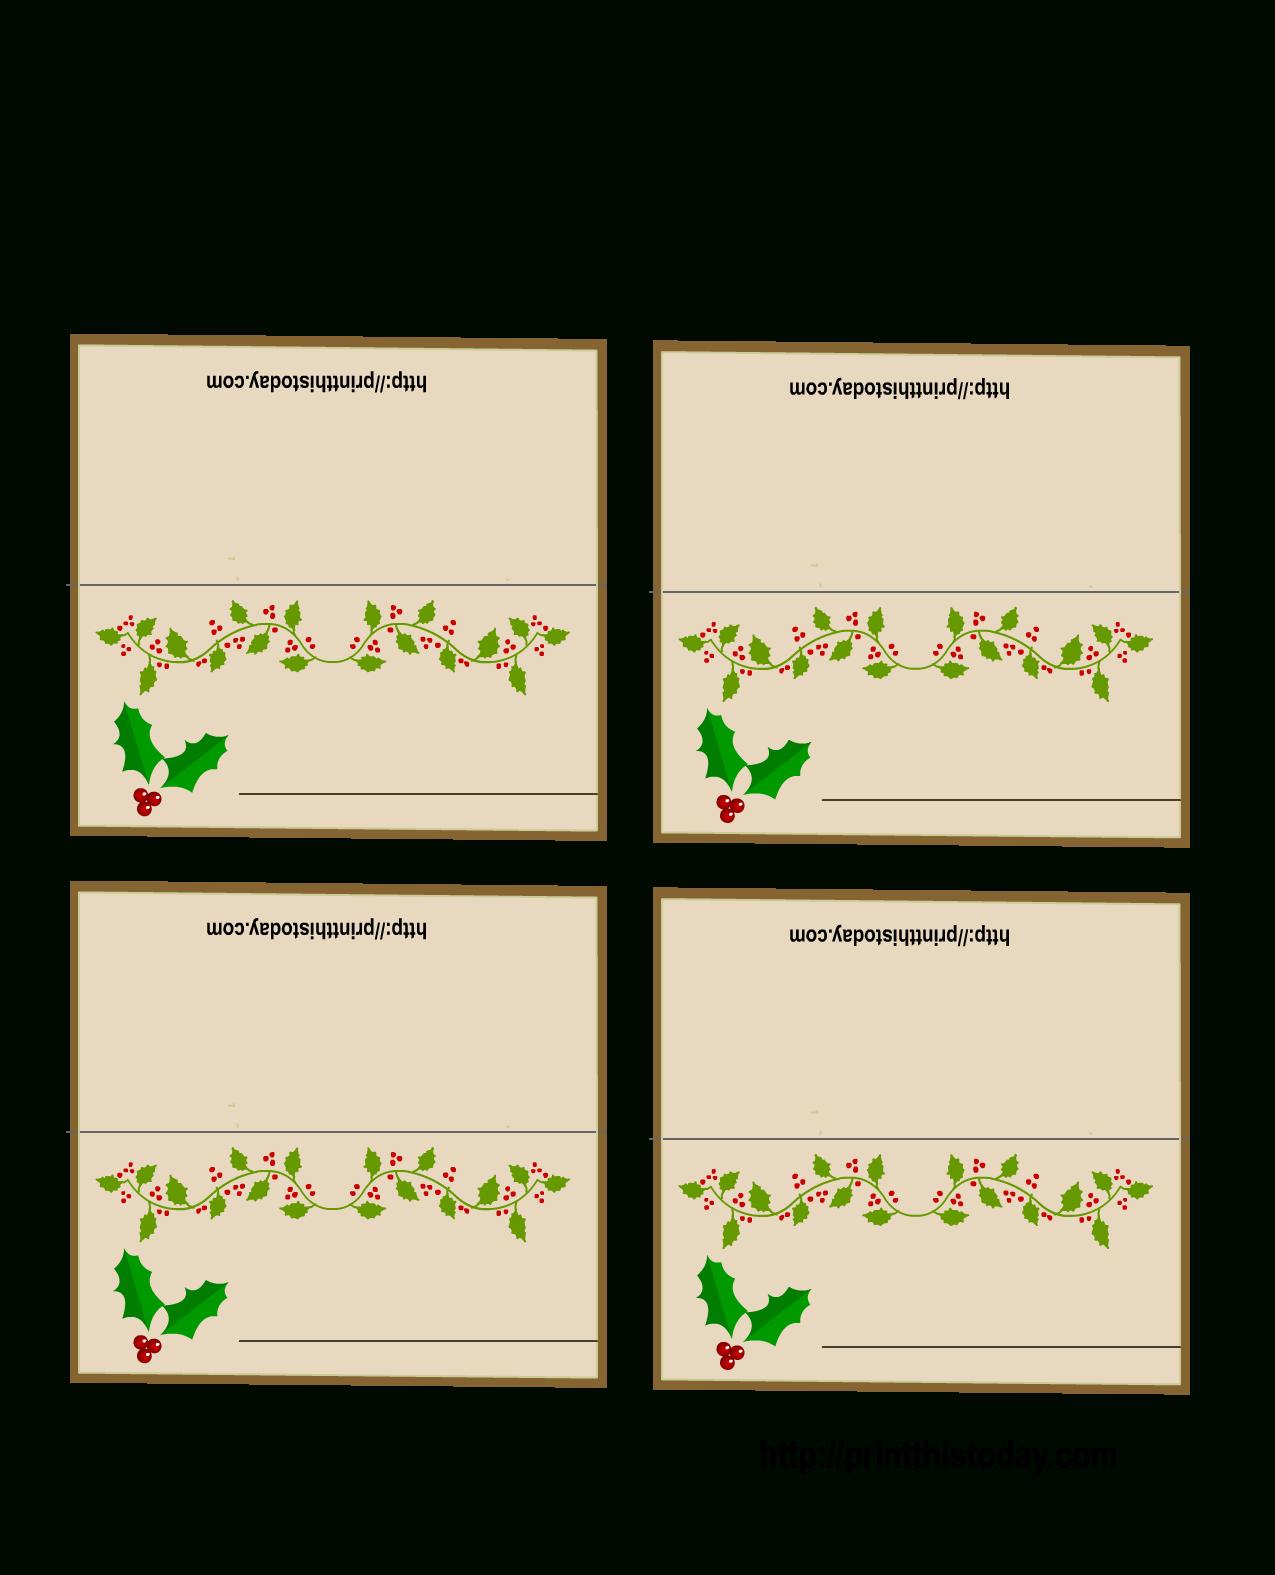 Free Printable Christmas Place-Cards - Free Printable Christmas Table Place Cards Template